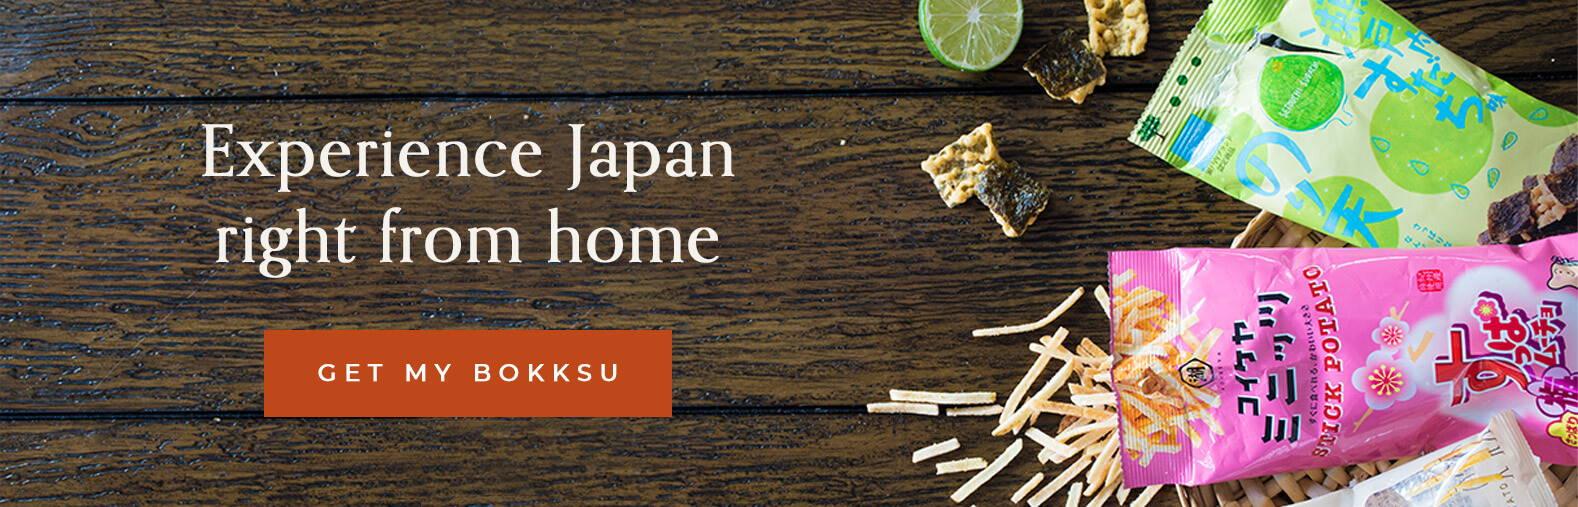 join bokksu japanese snack susbcription box service